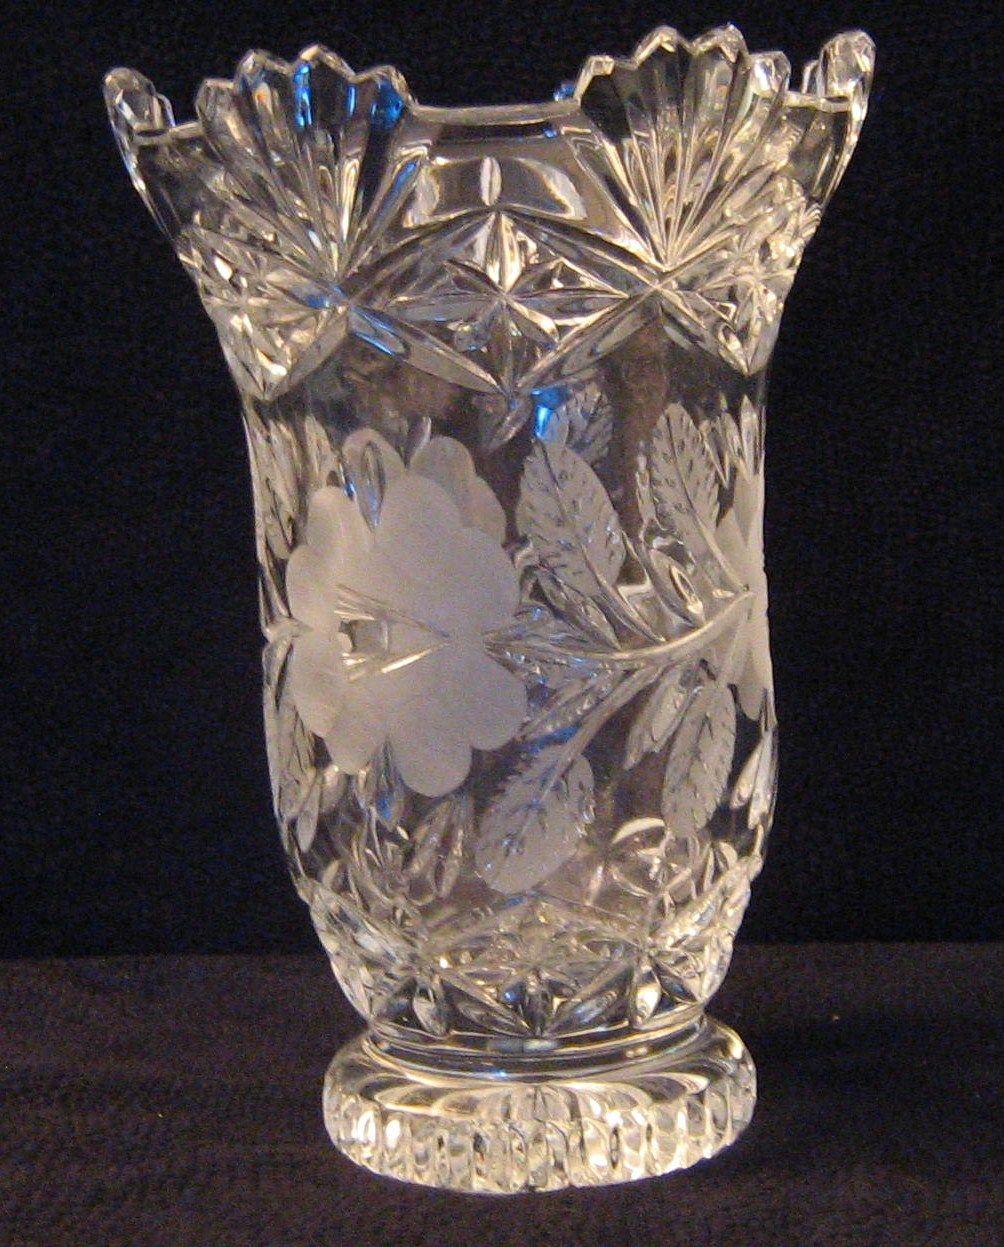 Large Crystal Vase Crystal Glassware Crystal Vase Engraved Crystal